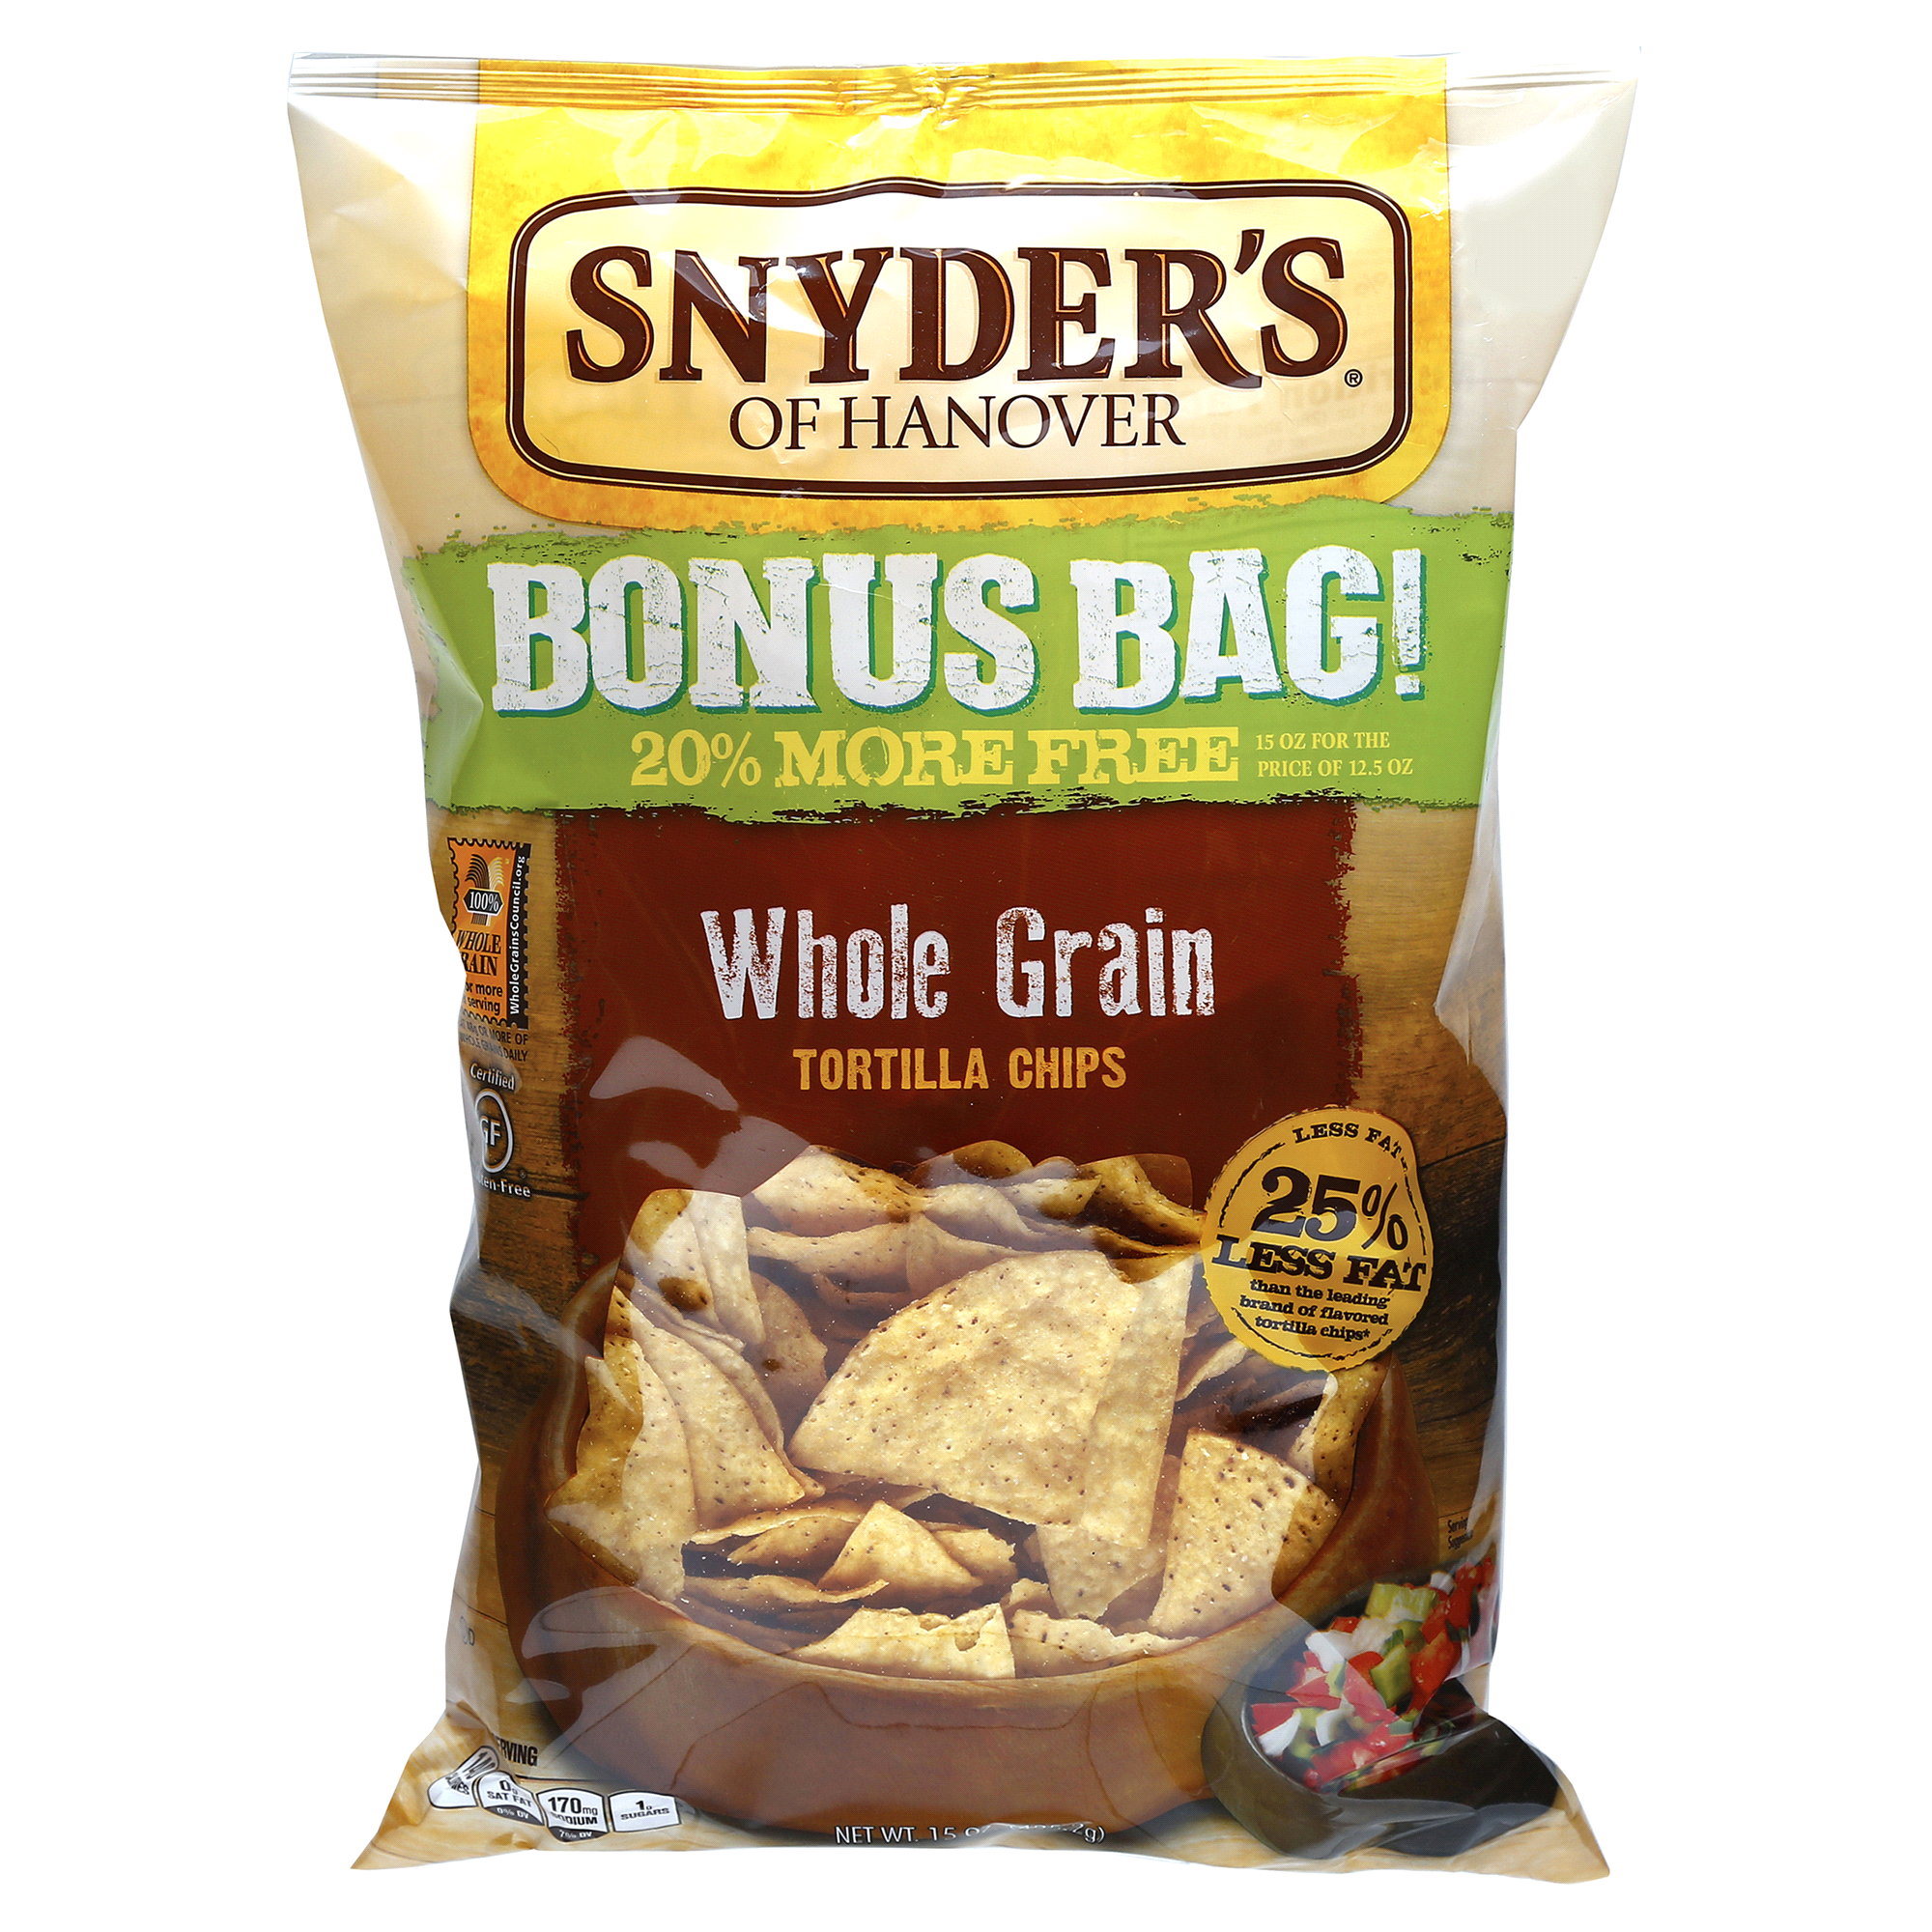 Snyders Tortilla Chips Whole Grain Reduced Fat 12.5 oz | Meijer.com